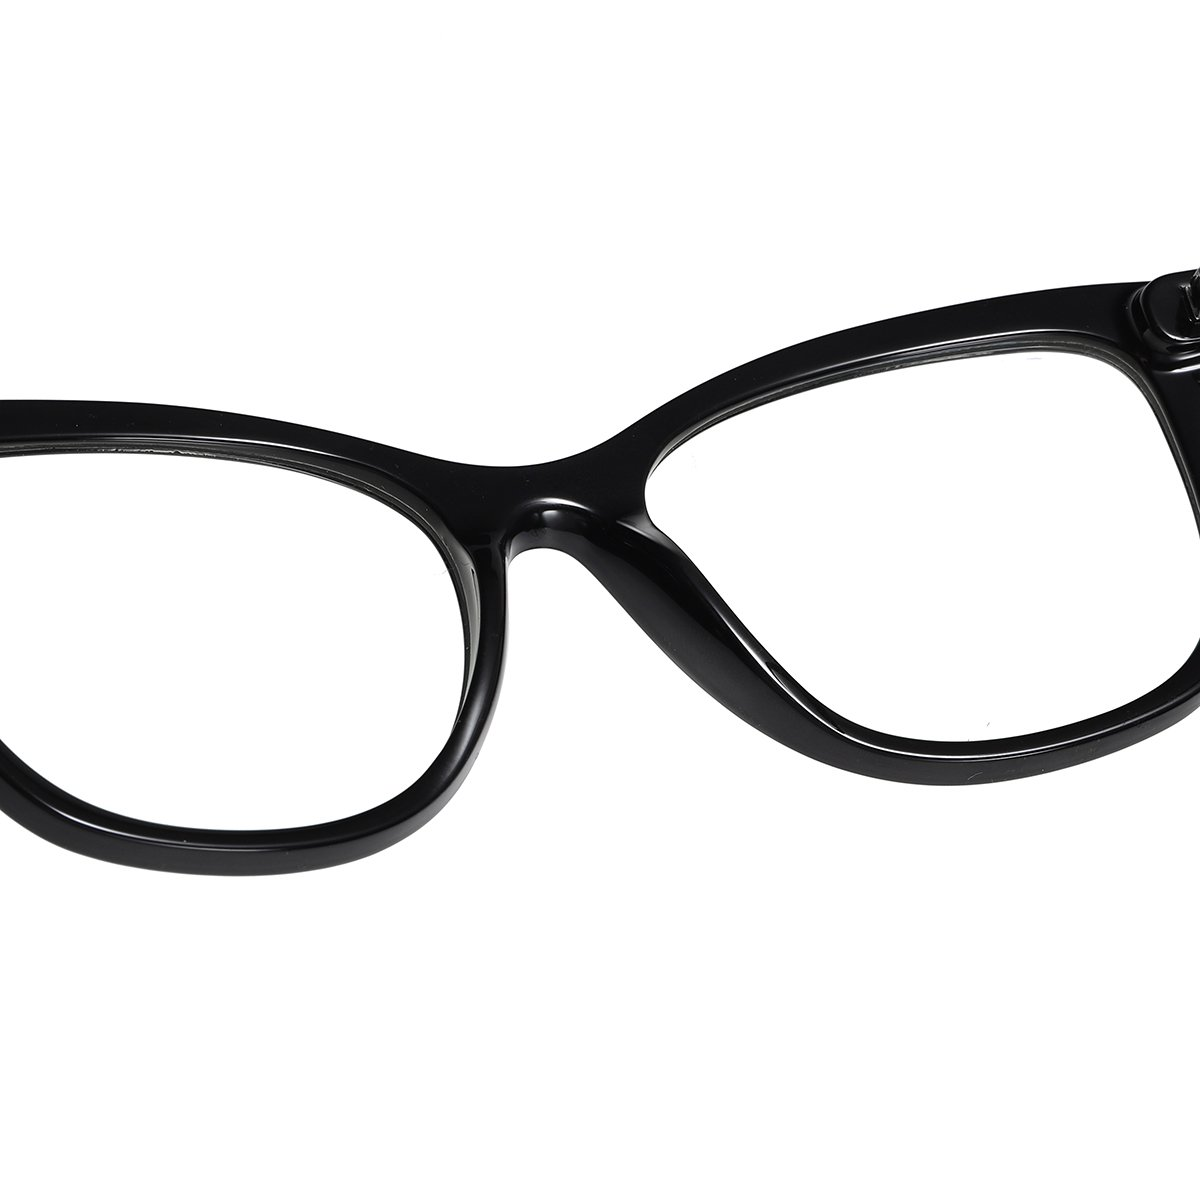 black frames with comfort nose pad